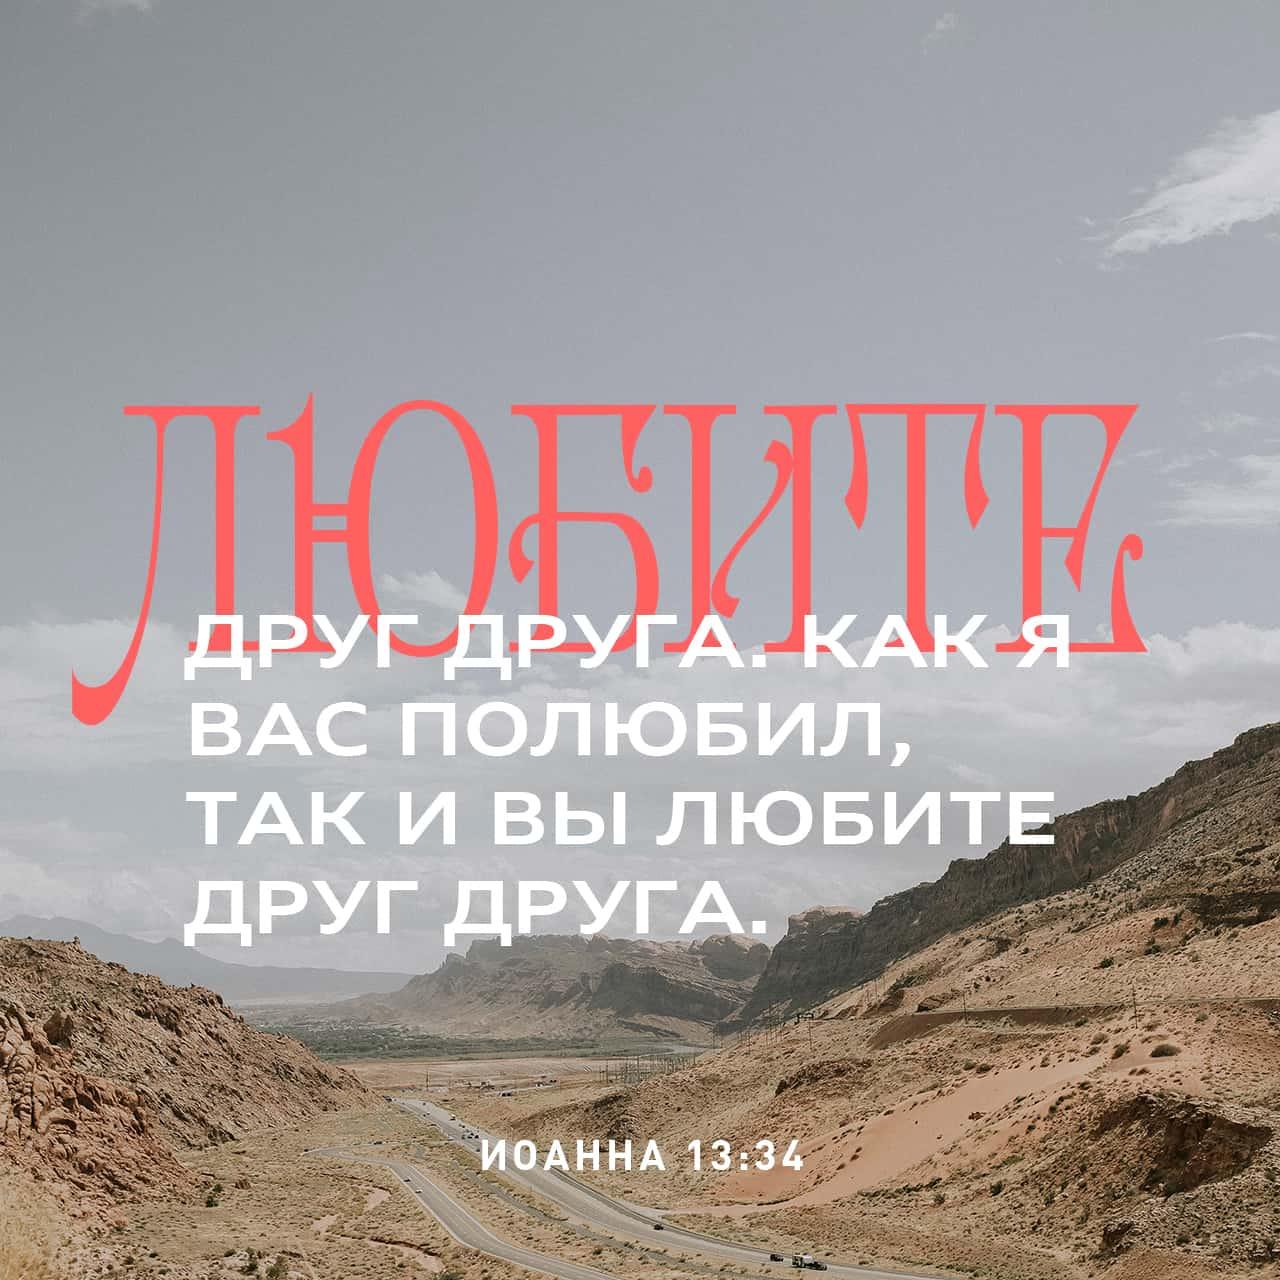 Любите друг друга - Иоанна 13-34 - фото-стих